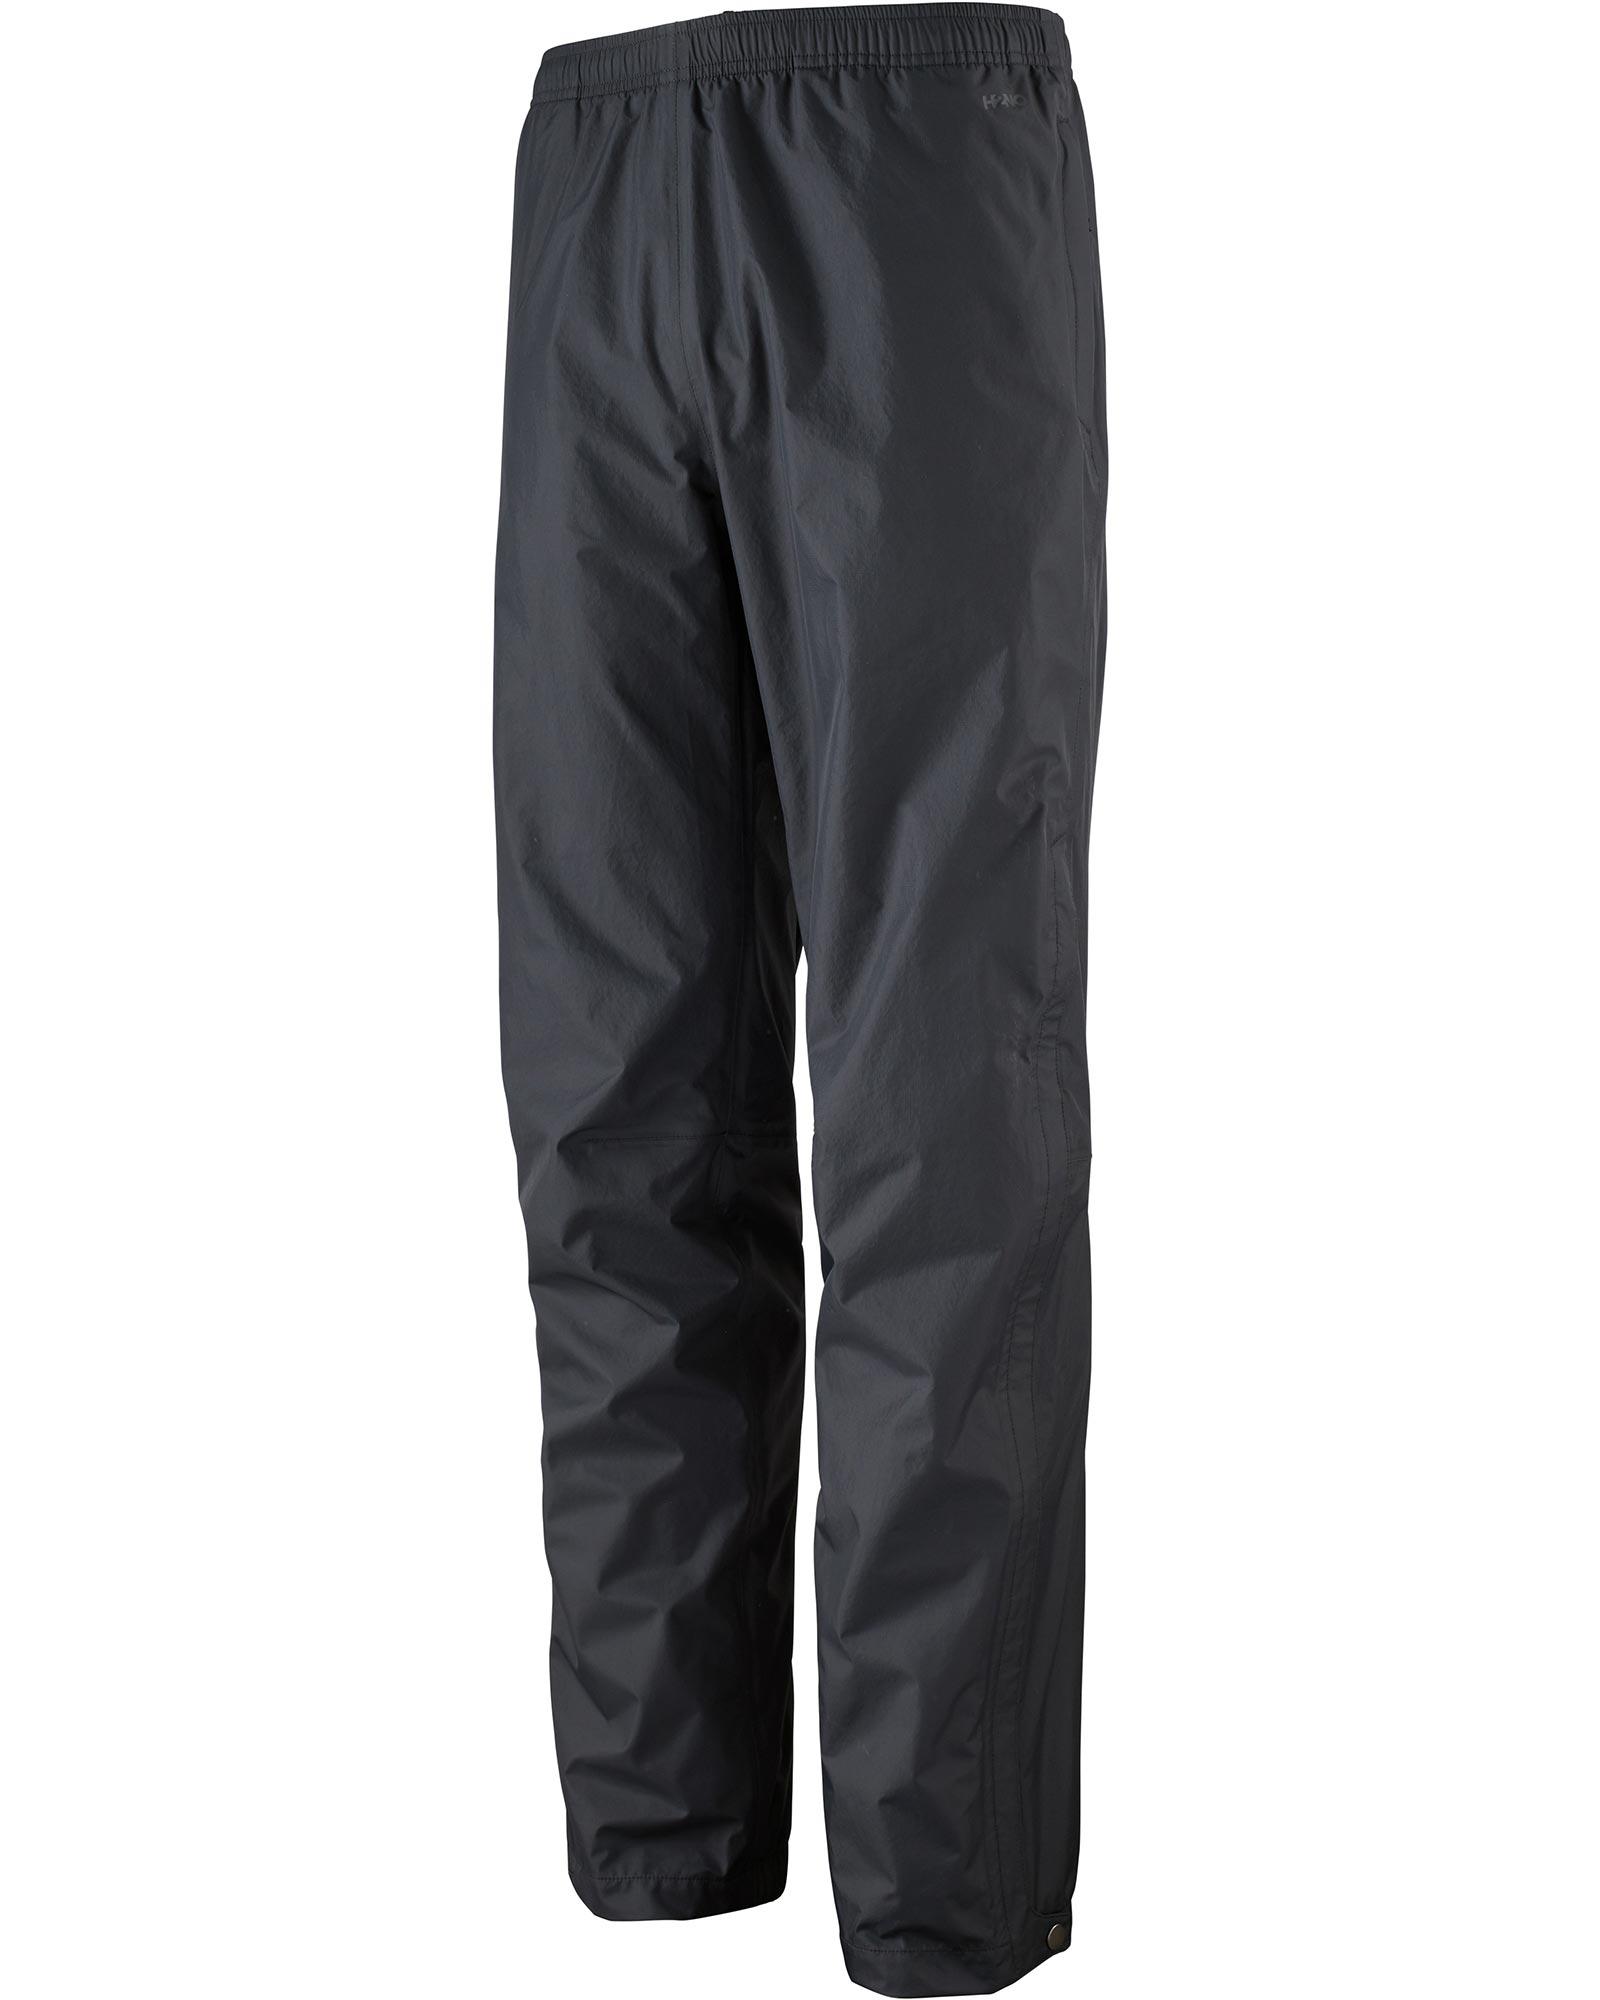 Patagonia Torrentshell 3L Men's Pants 0